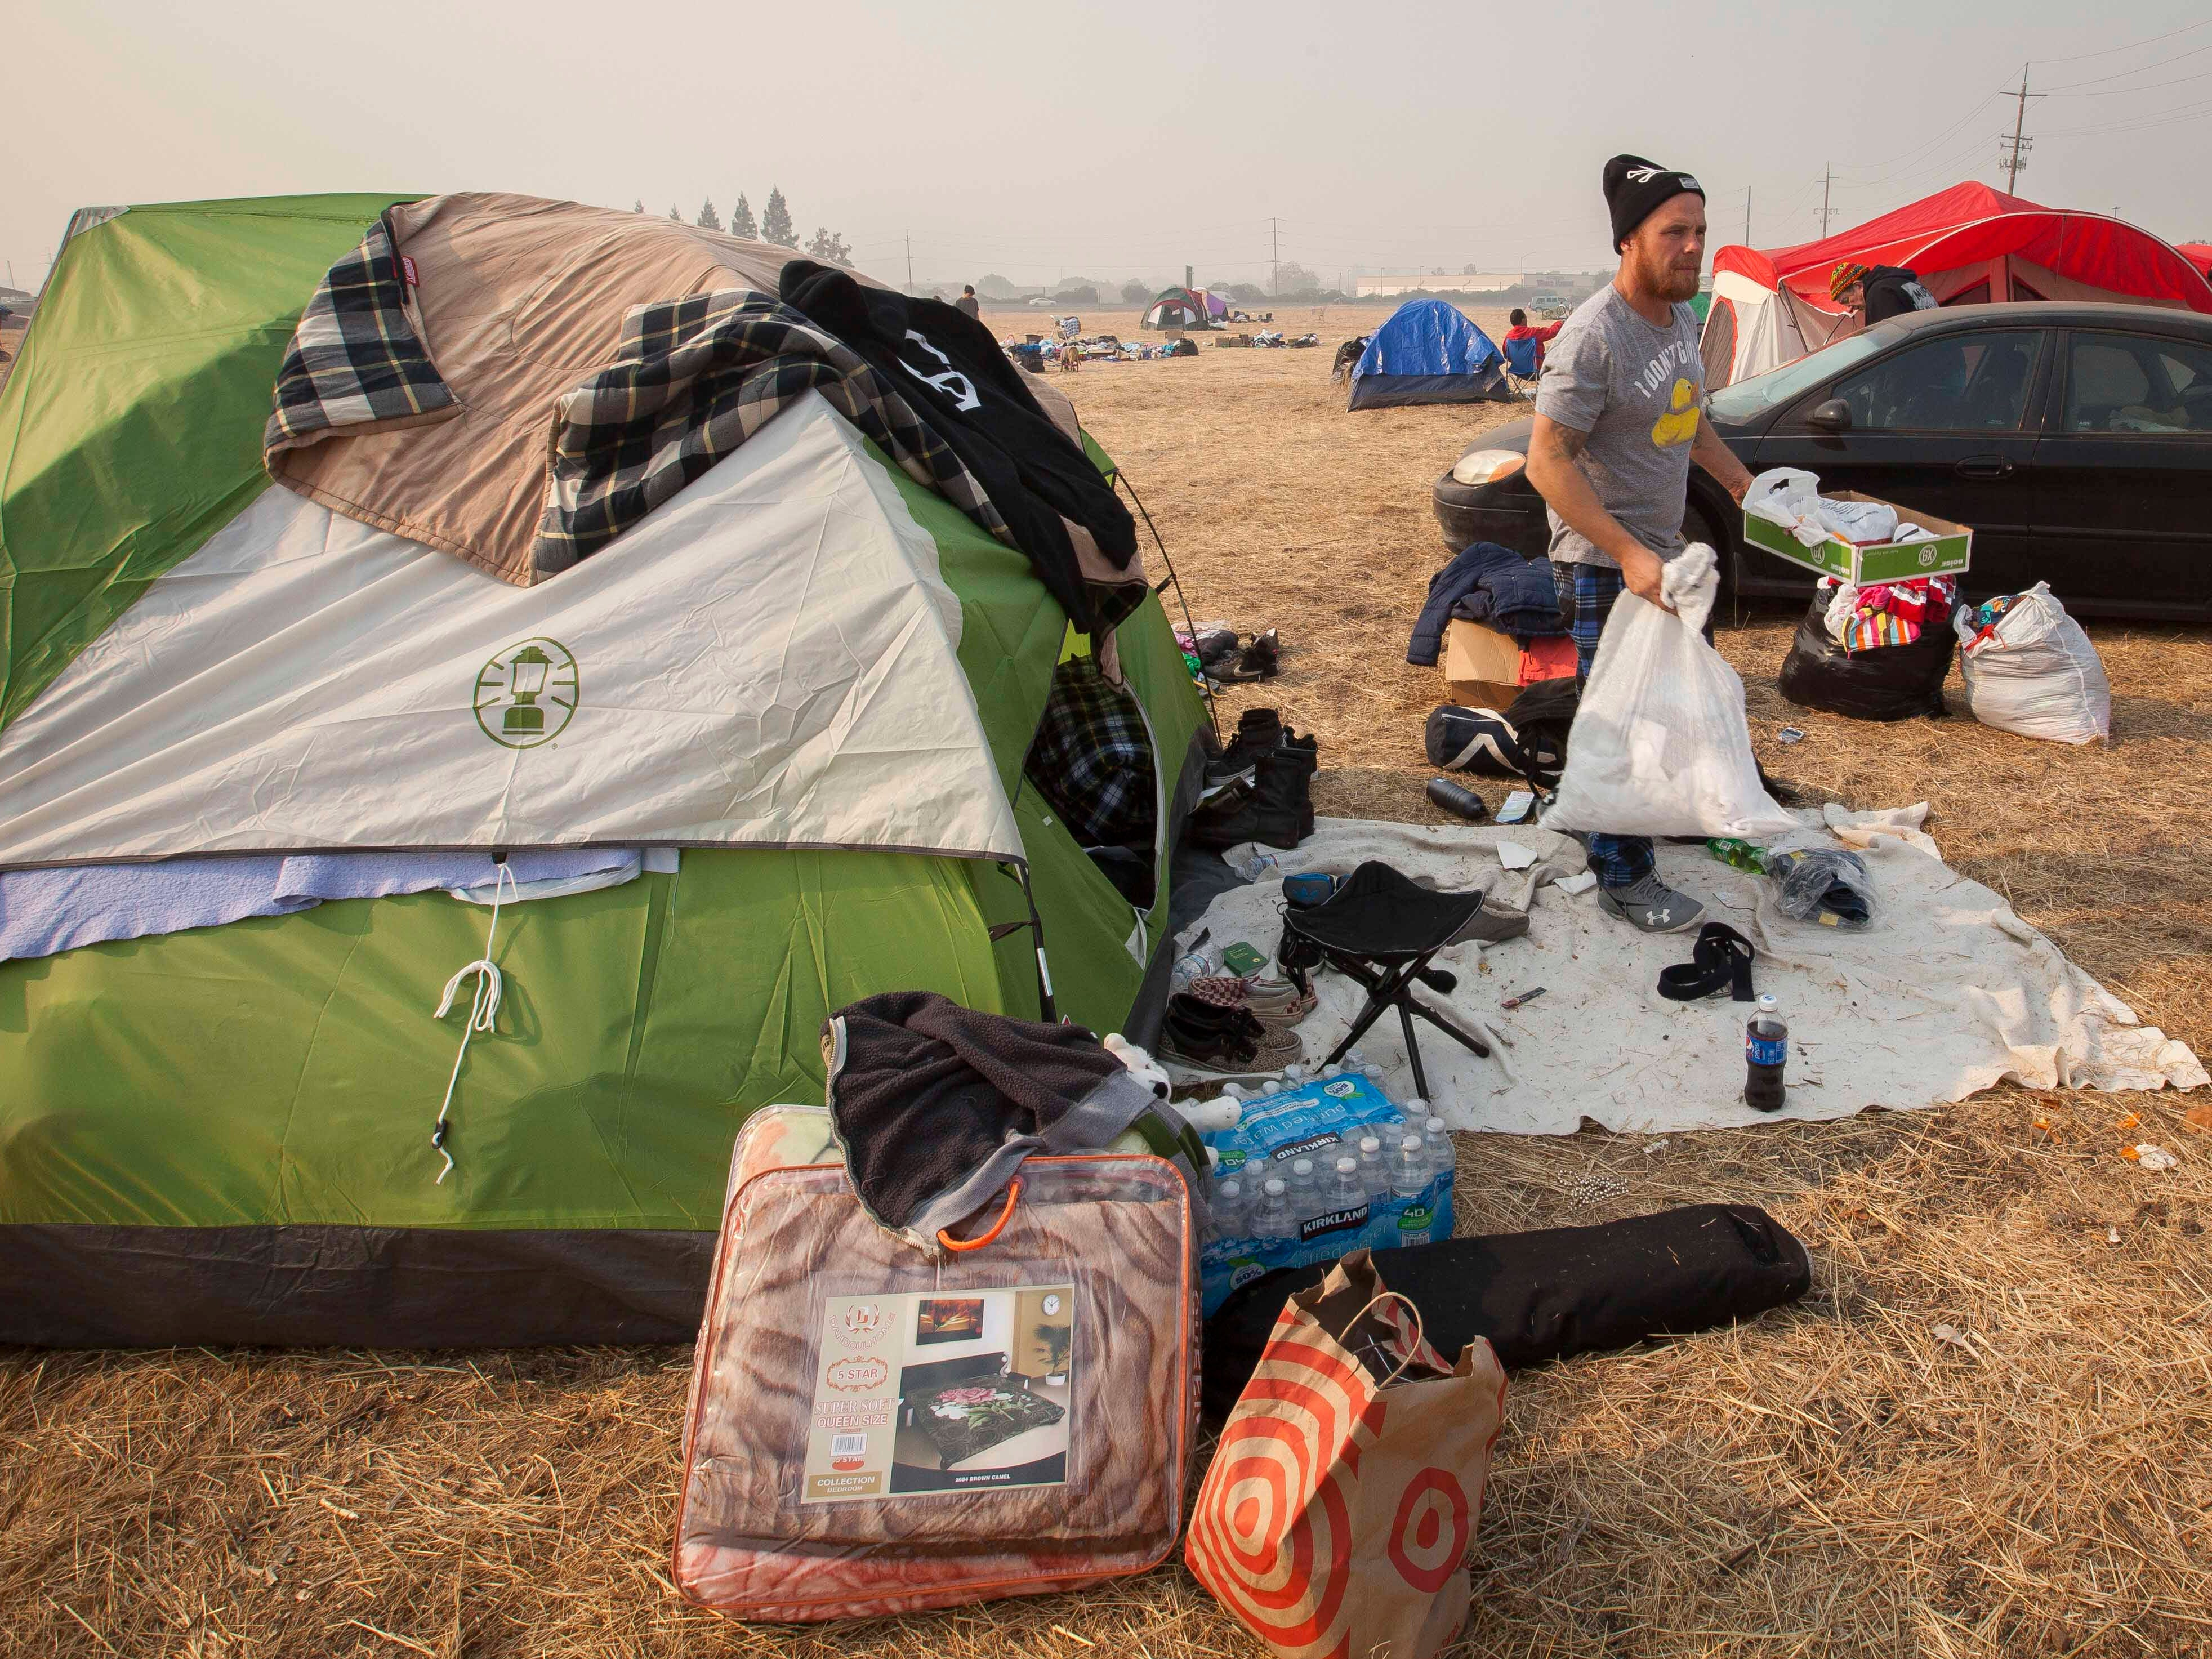 Ryan Vaughn begins to pack his belongings from the field next to the Walmart in Chico, Calif. on Nov. 18, 2018.